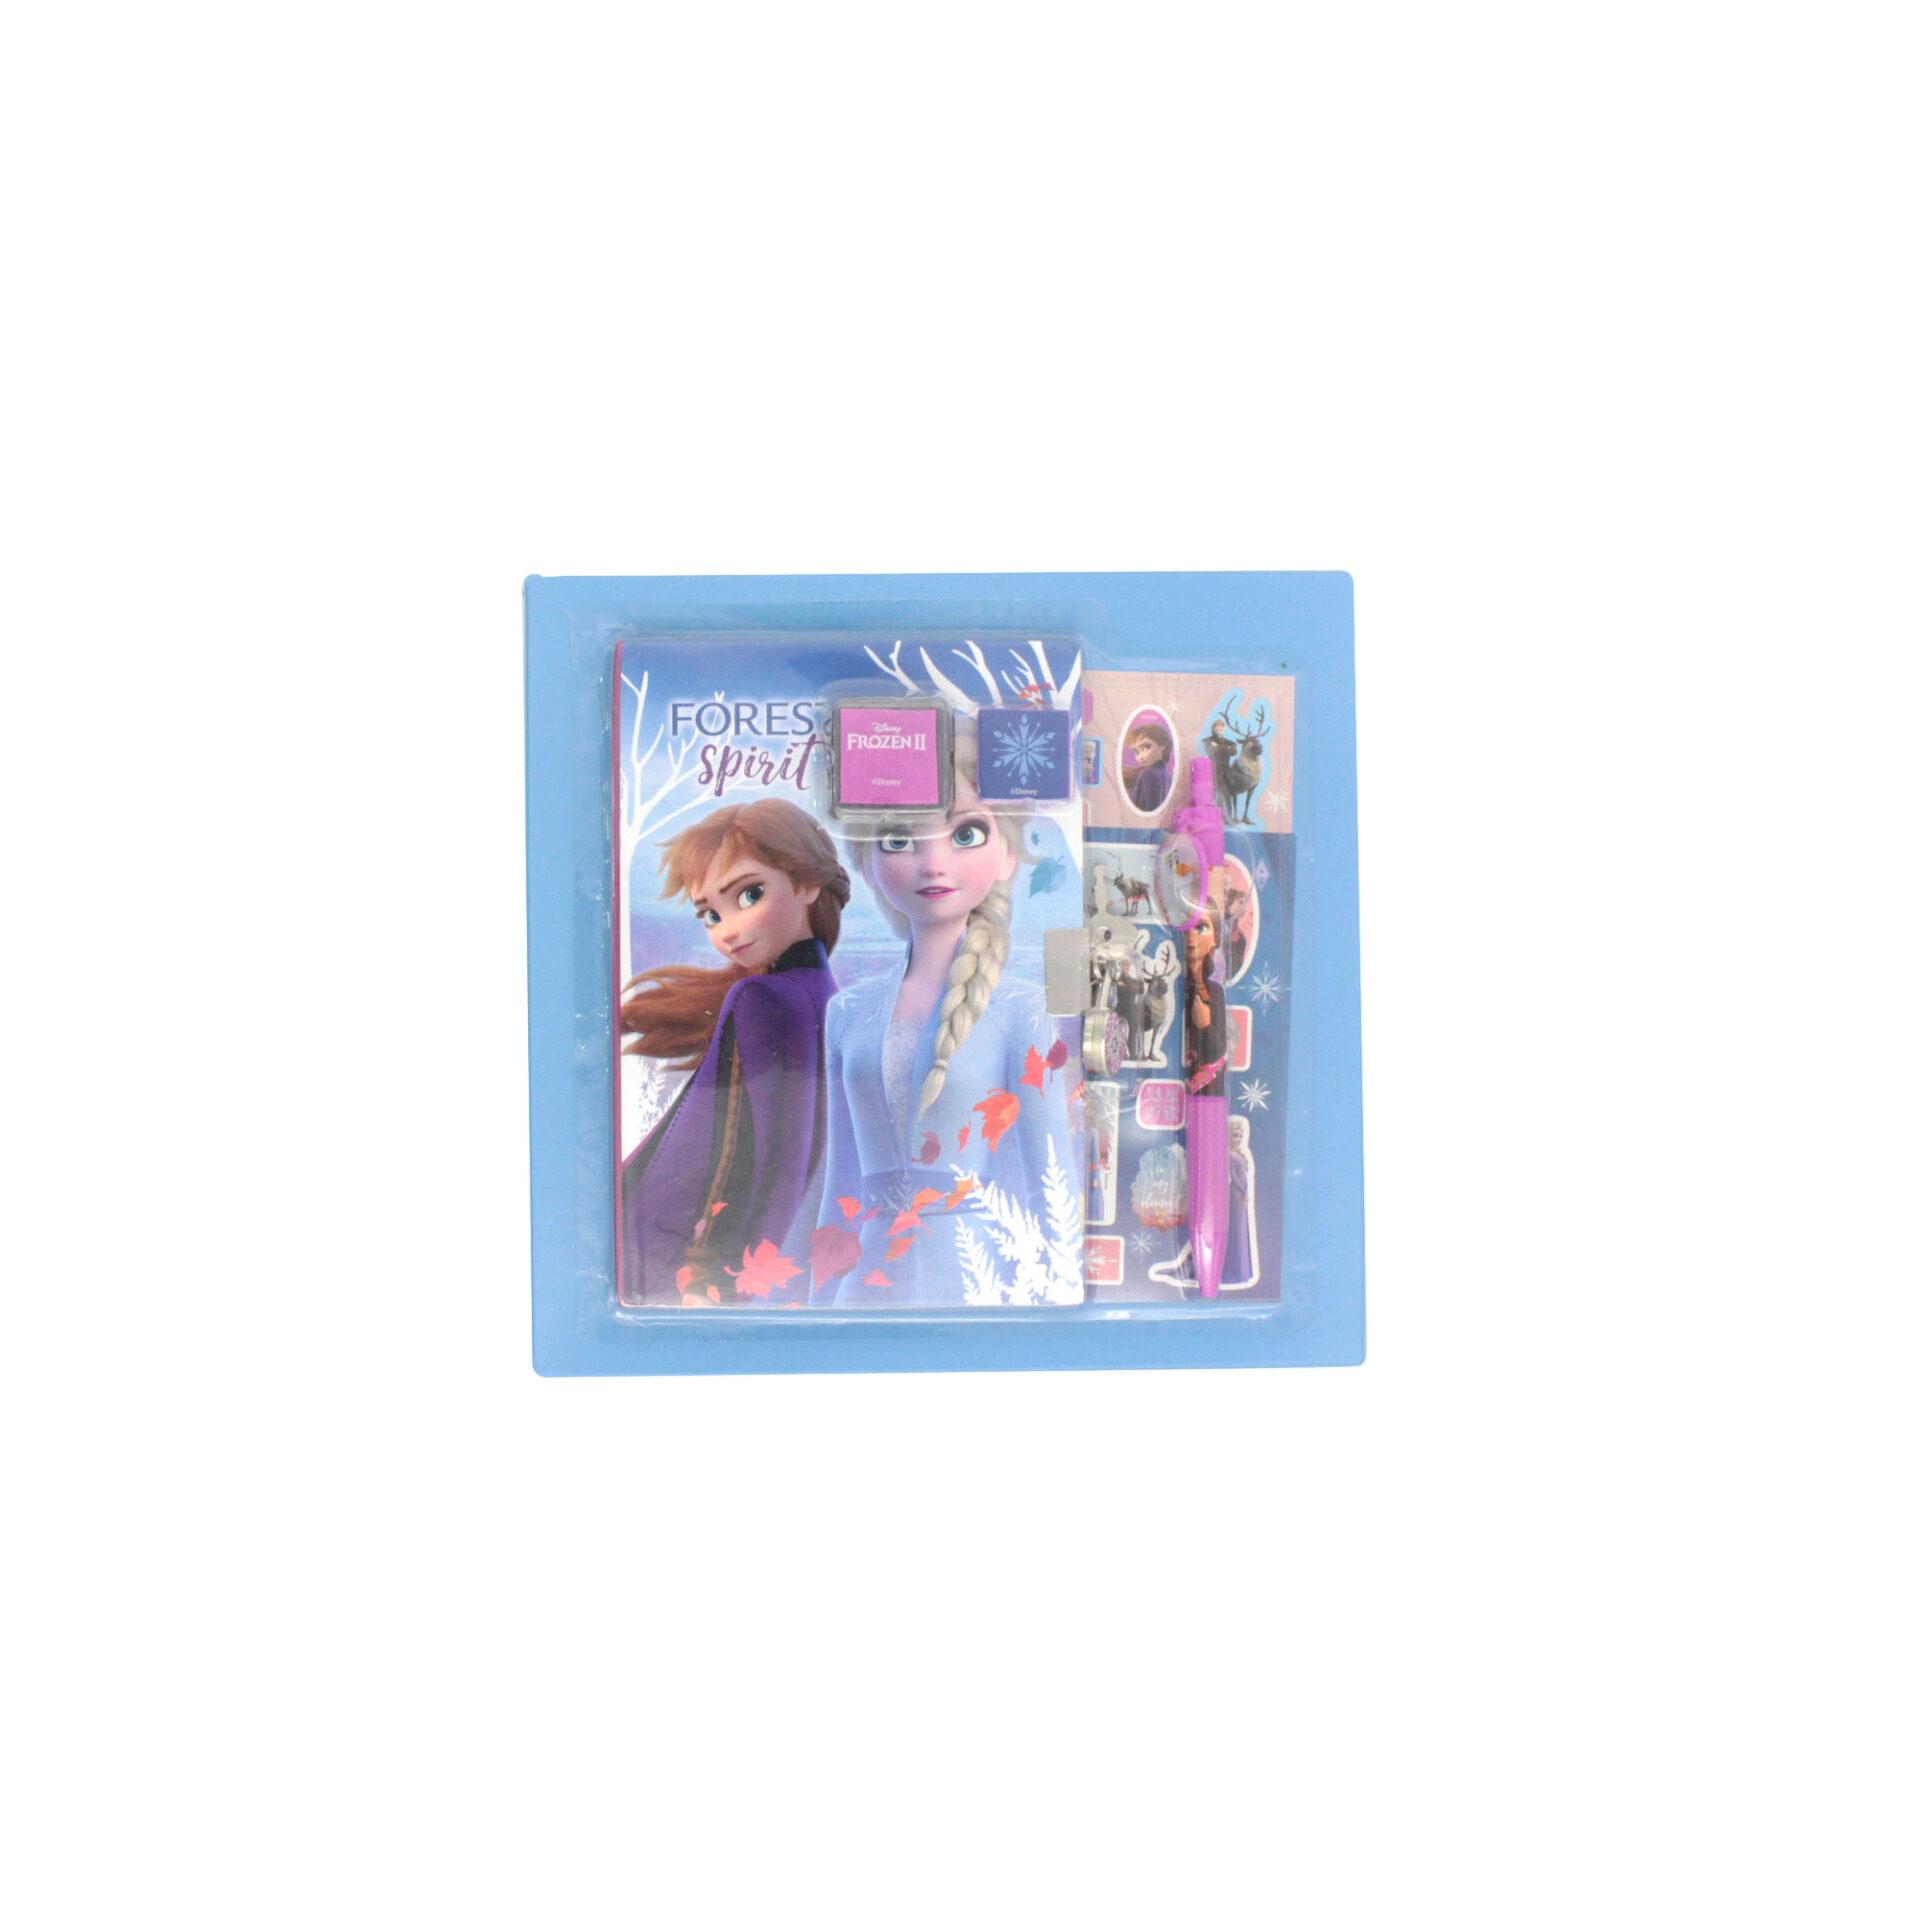 Disney Frozen 2 Princess Elsa & Anna Secret Diary Set With Lock & 2 Keys, Pen, Stamp Pad, Stamper & 2 Sticker Sheets For Girls